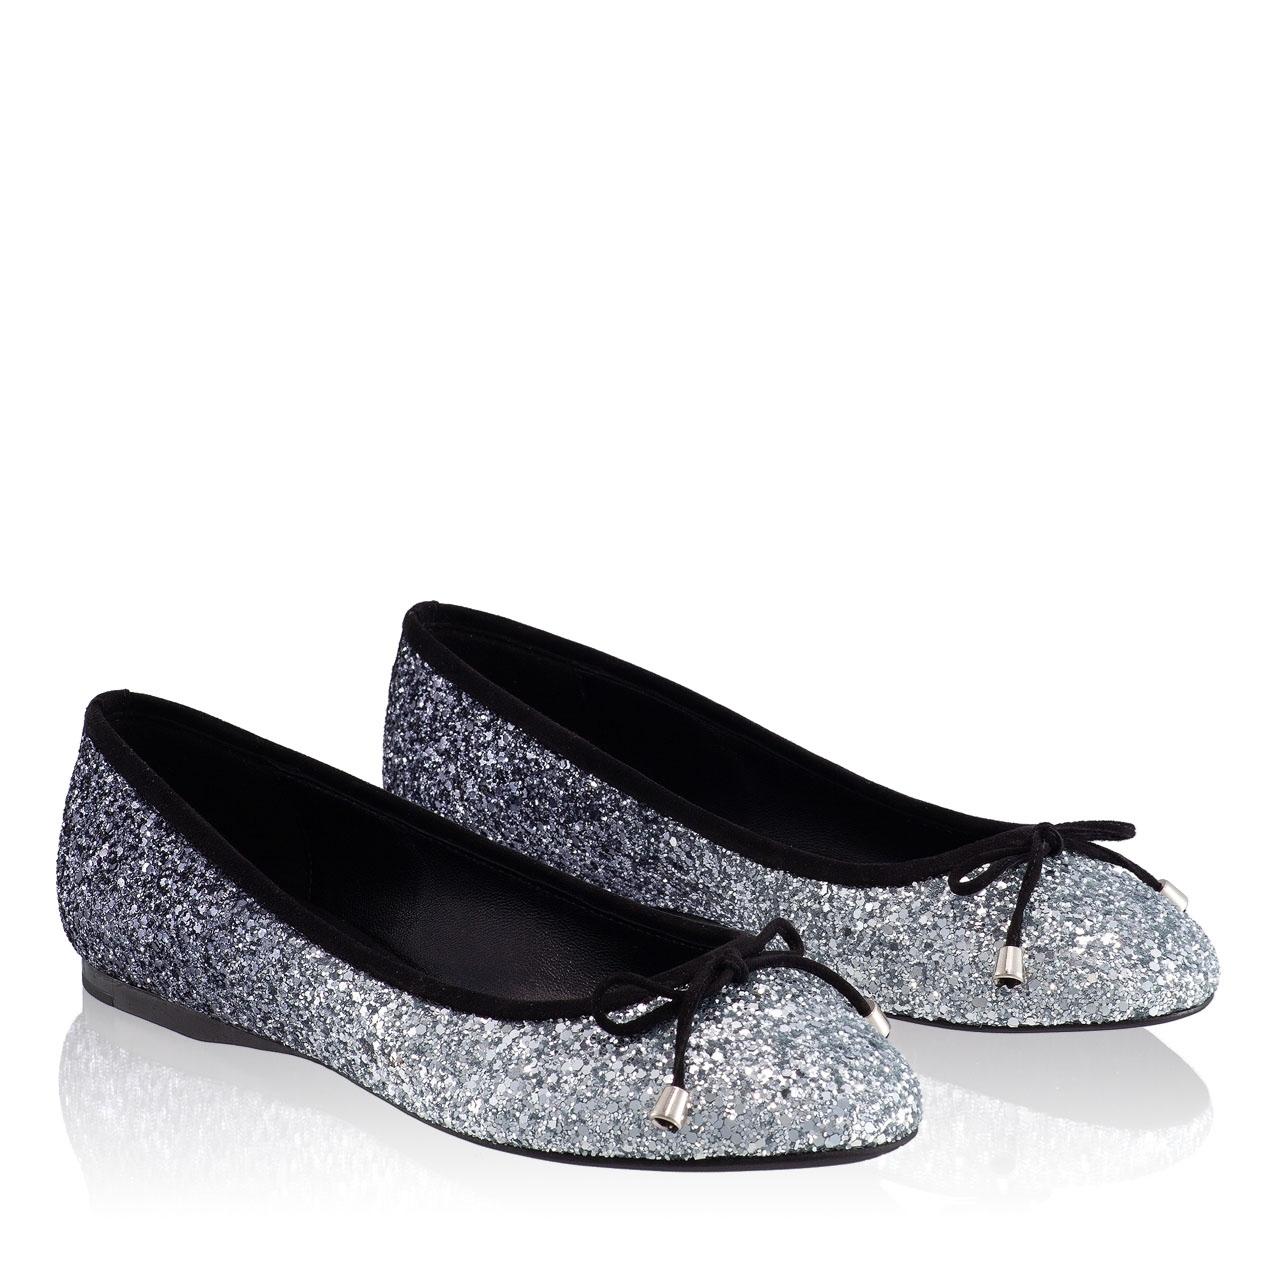 Balerini Dama 5510 Glitter Argento